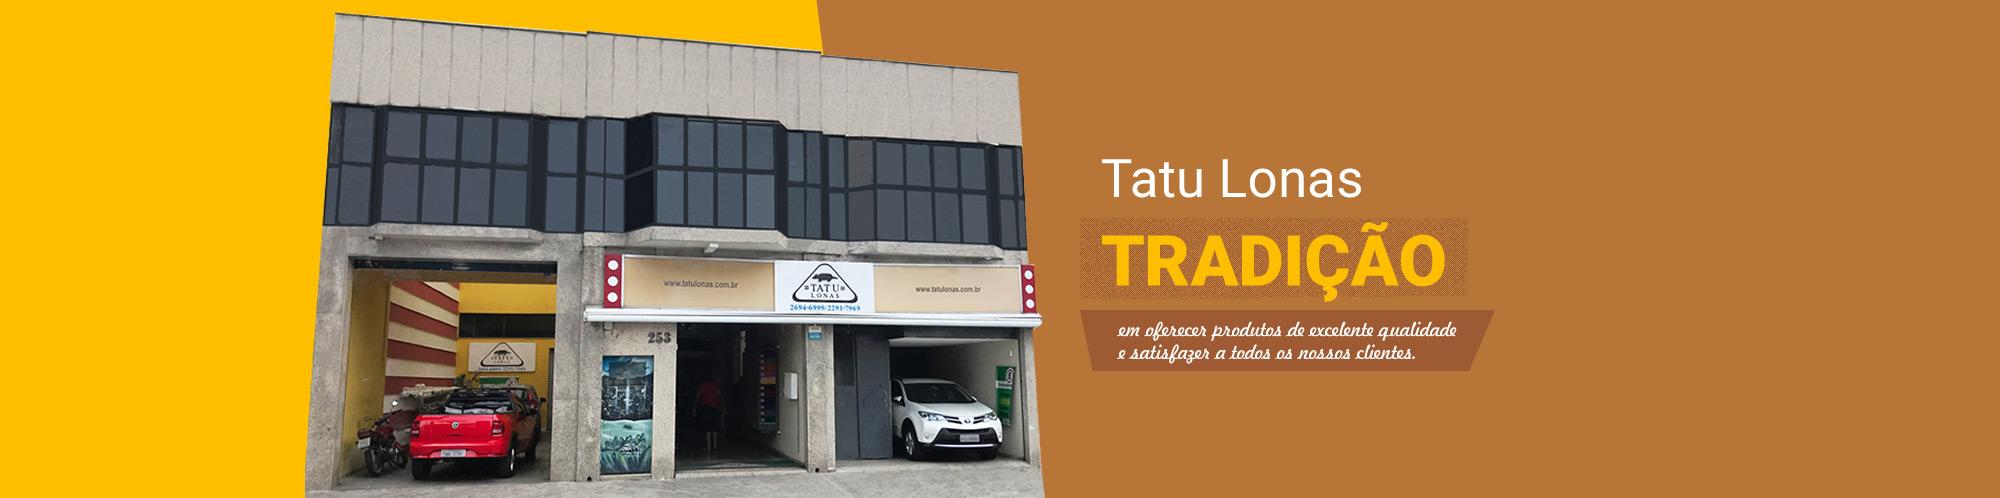 banner-tatu-lonas-tradicao